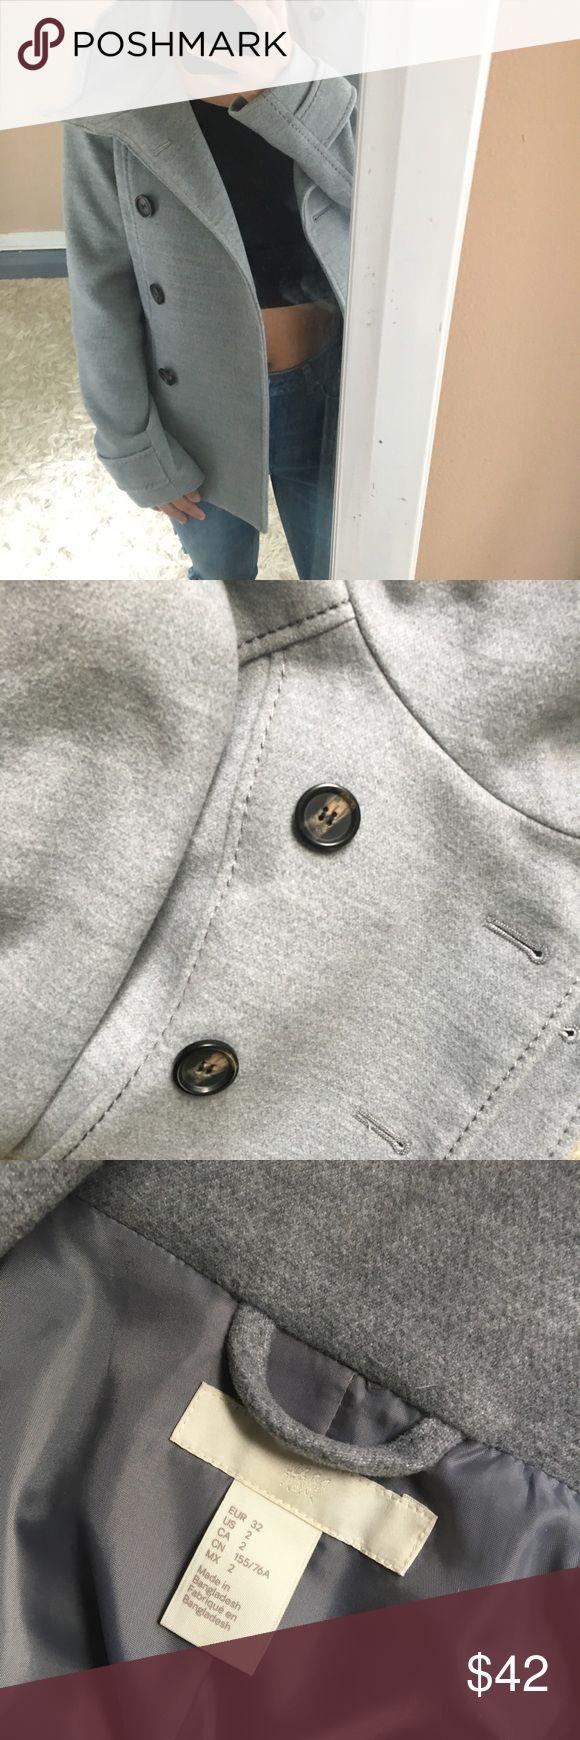 Pea coat Gray pea coat, great look for fall in a city 🌃 H&M Jackets & Coats Pea Coats